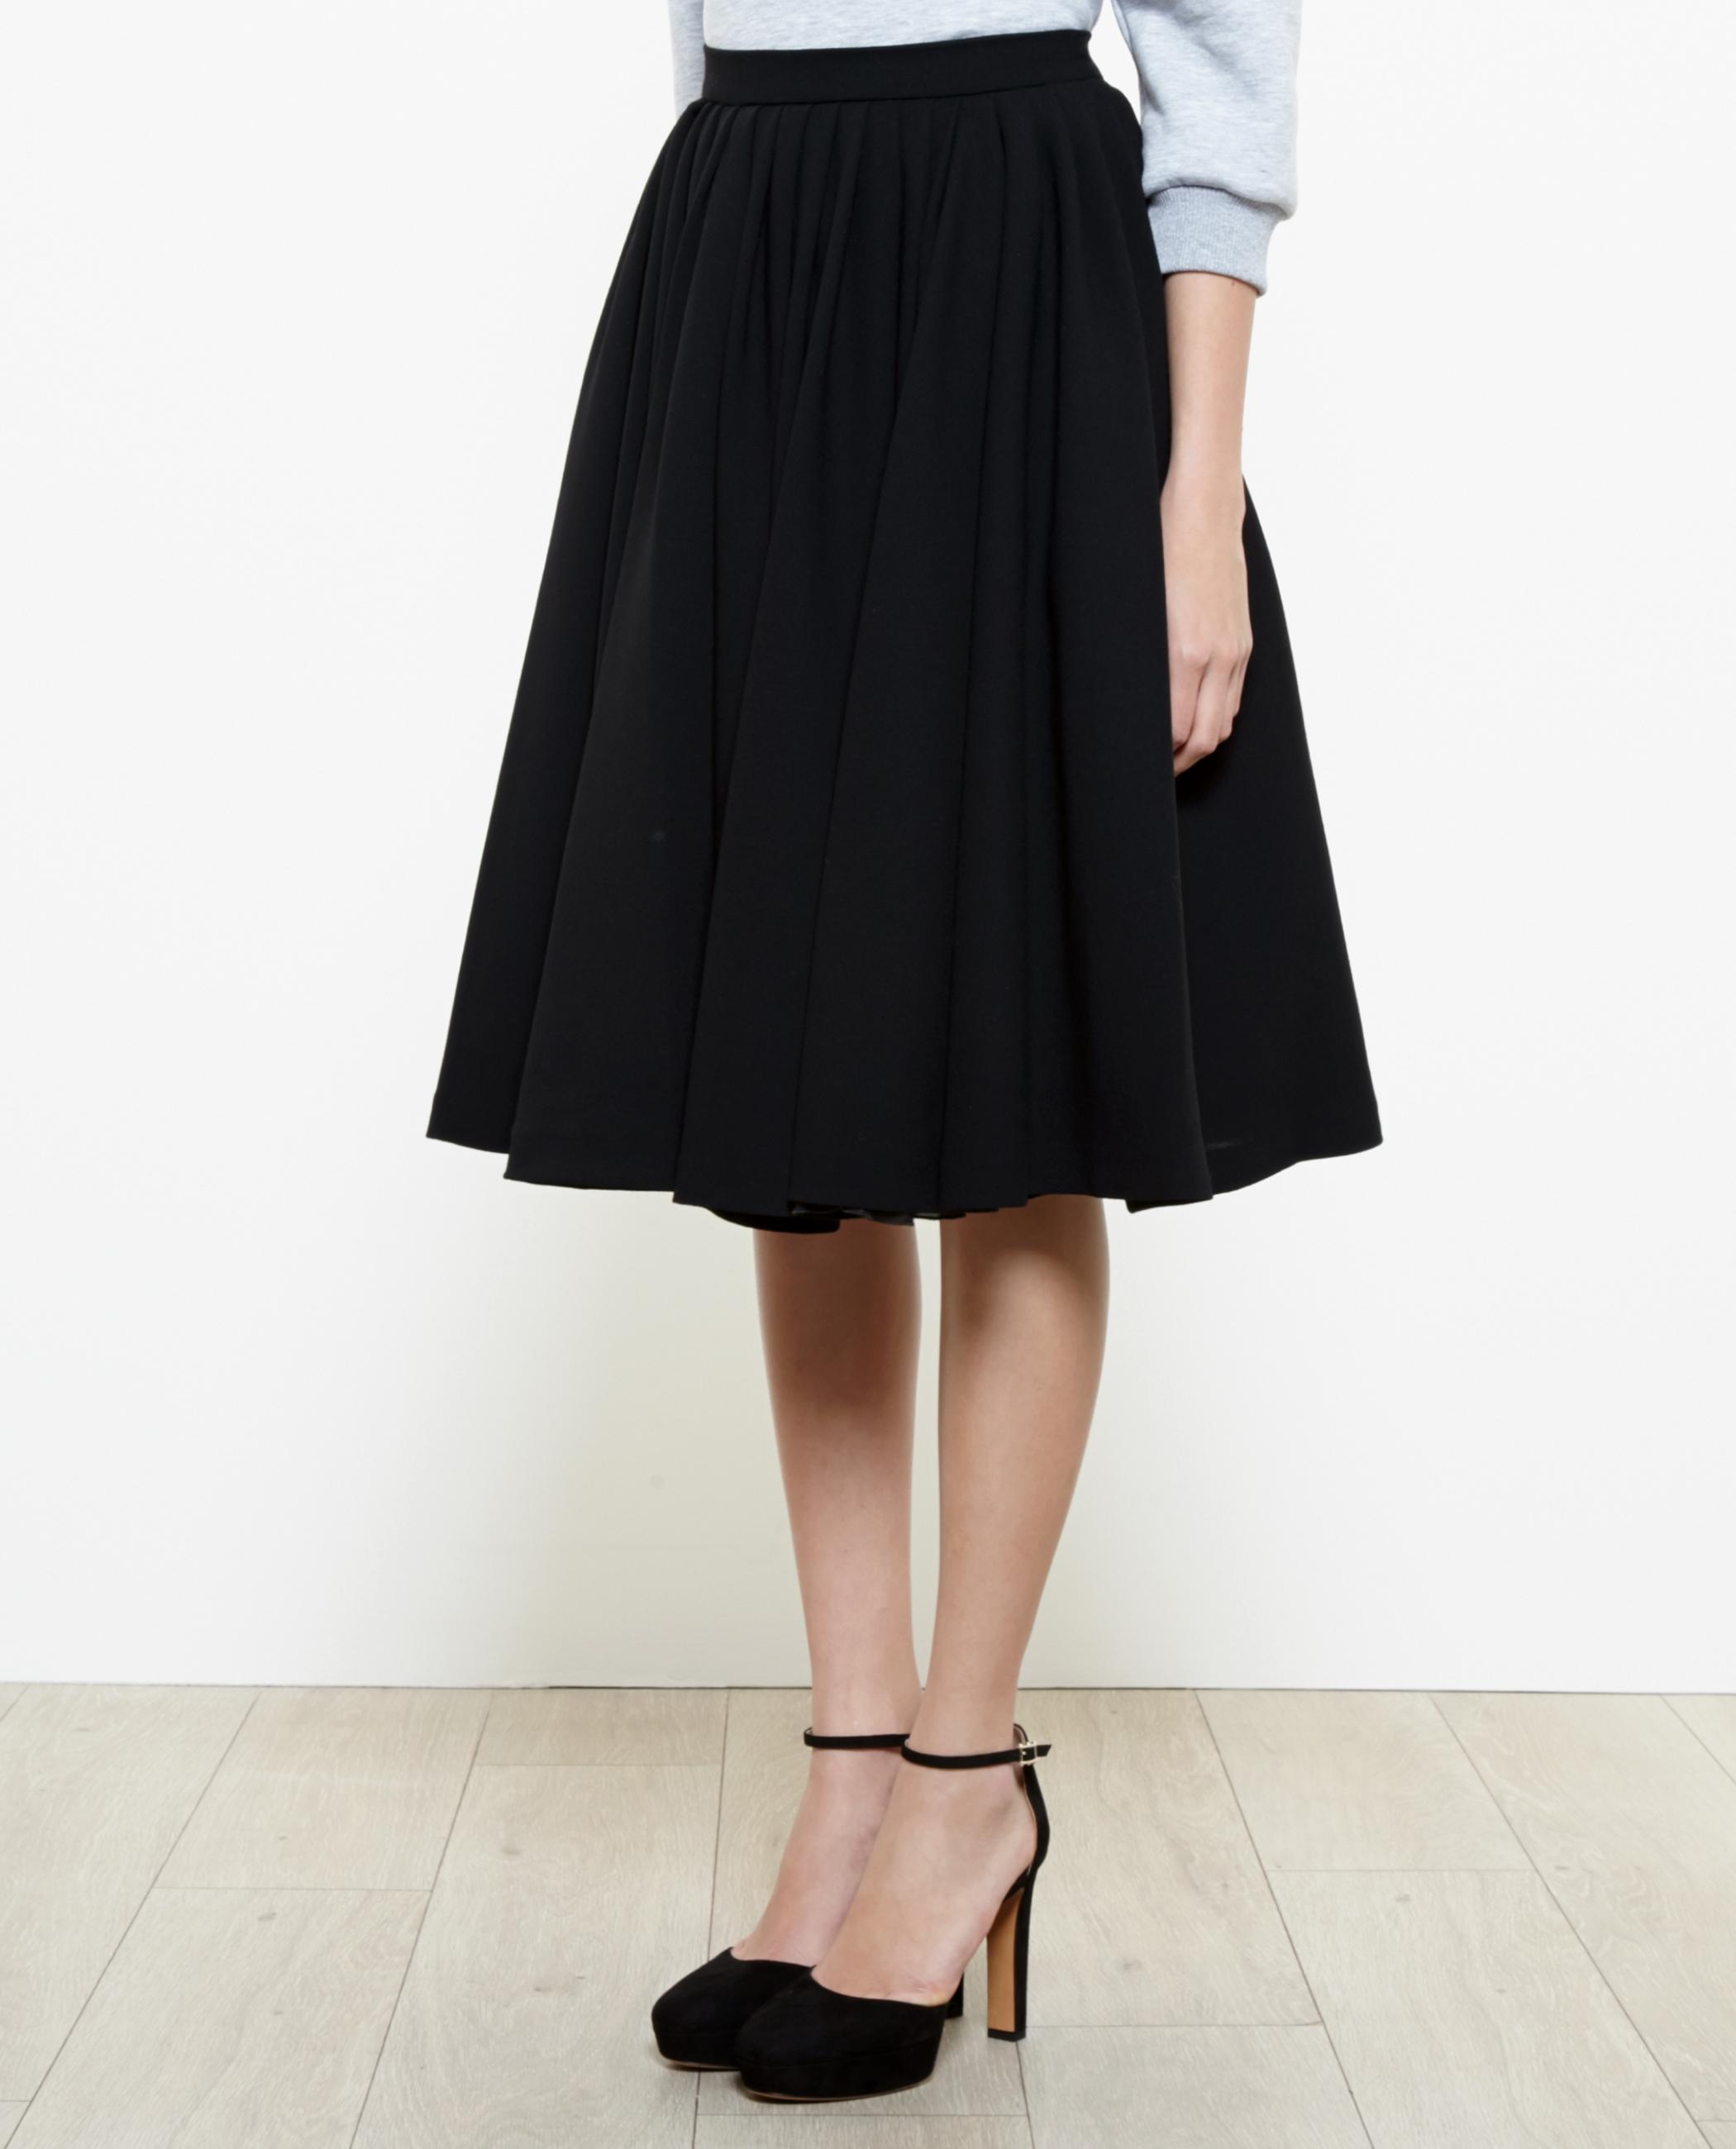 8cdd016591 Natasha Zinko Pleated Wool Midi Skirt in Black - Lyst